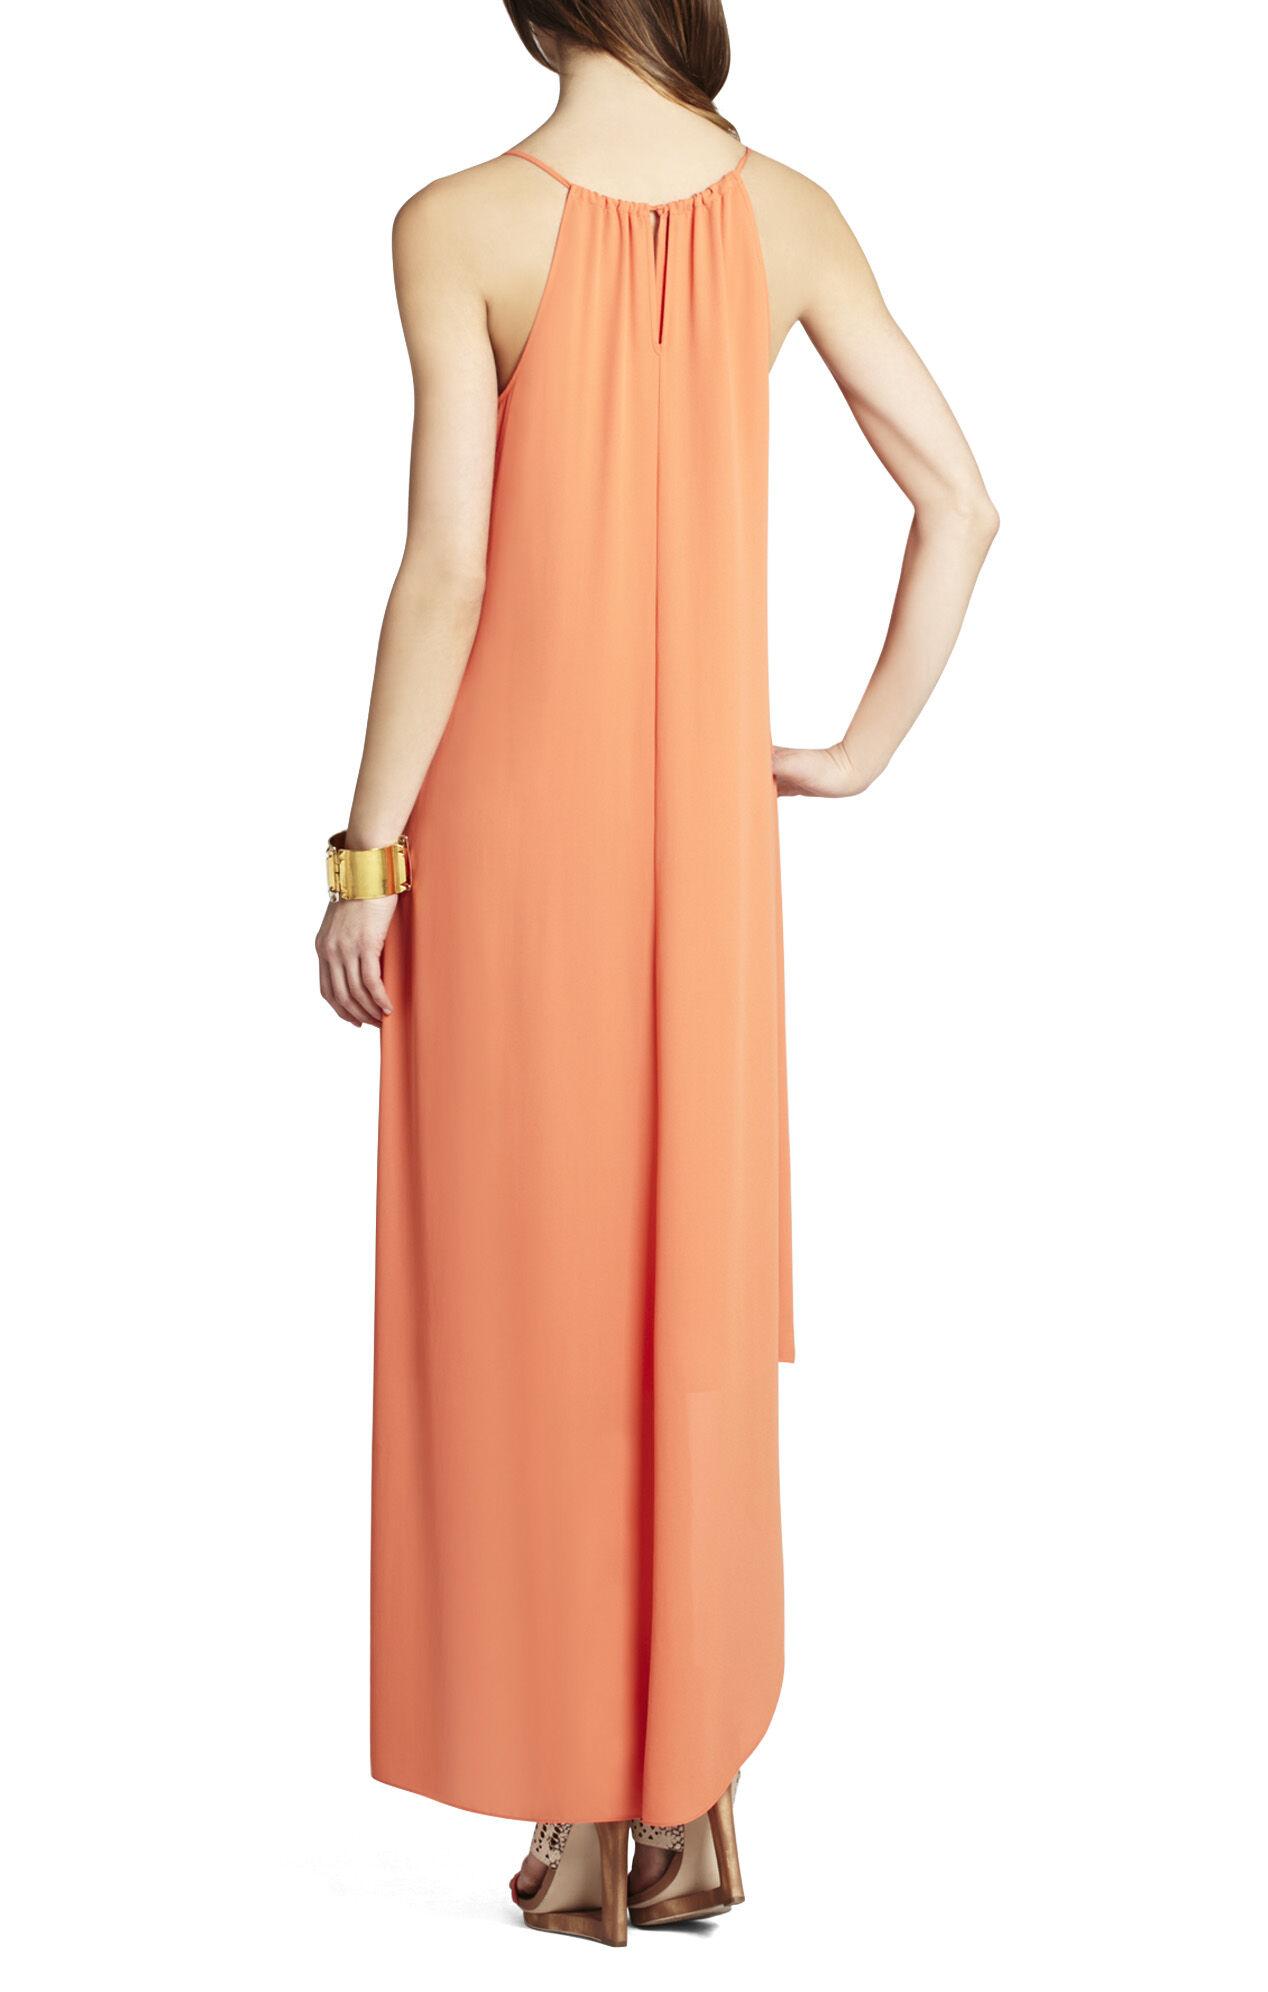 Rory Sleeveless Dress With High-Low Hem